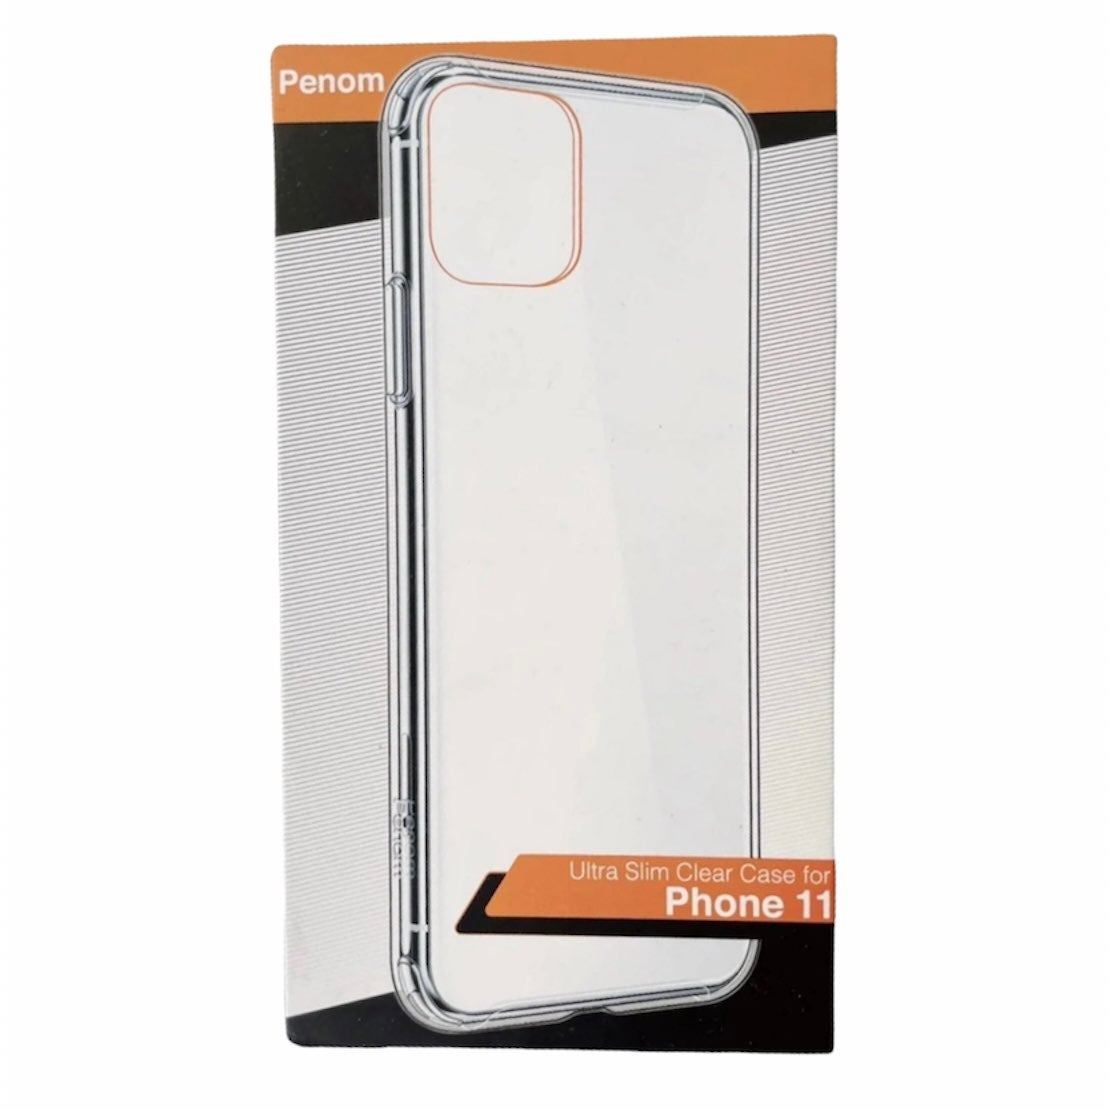 New iPhone 11 Ultra Slim Clear Case